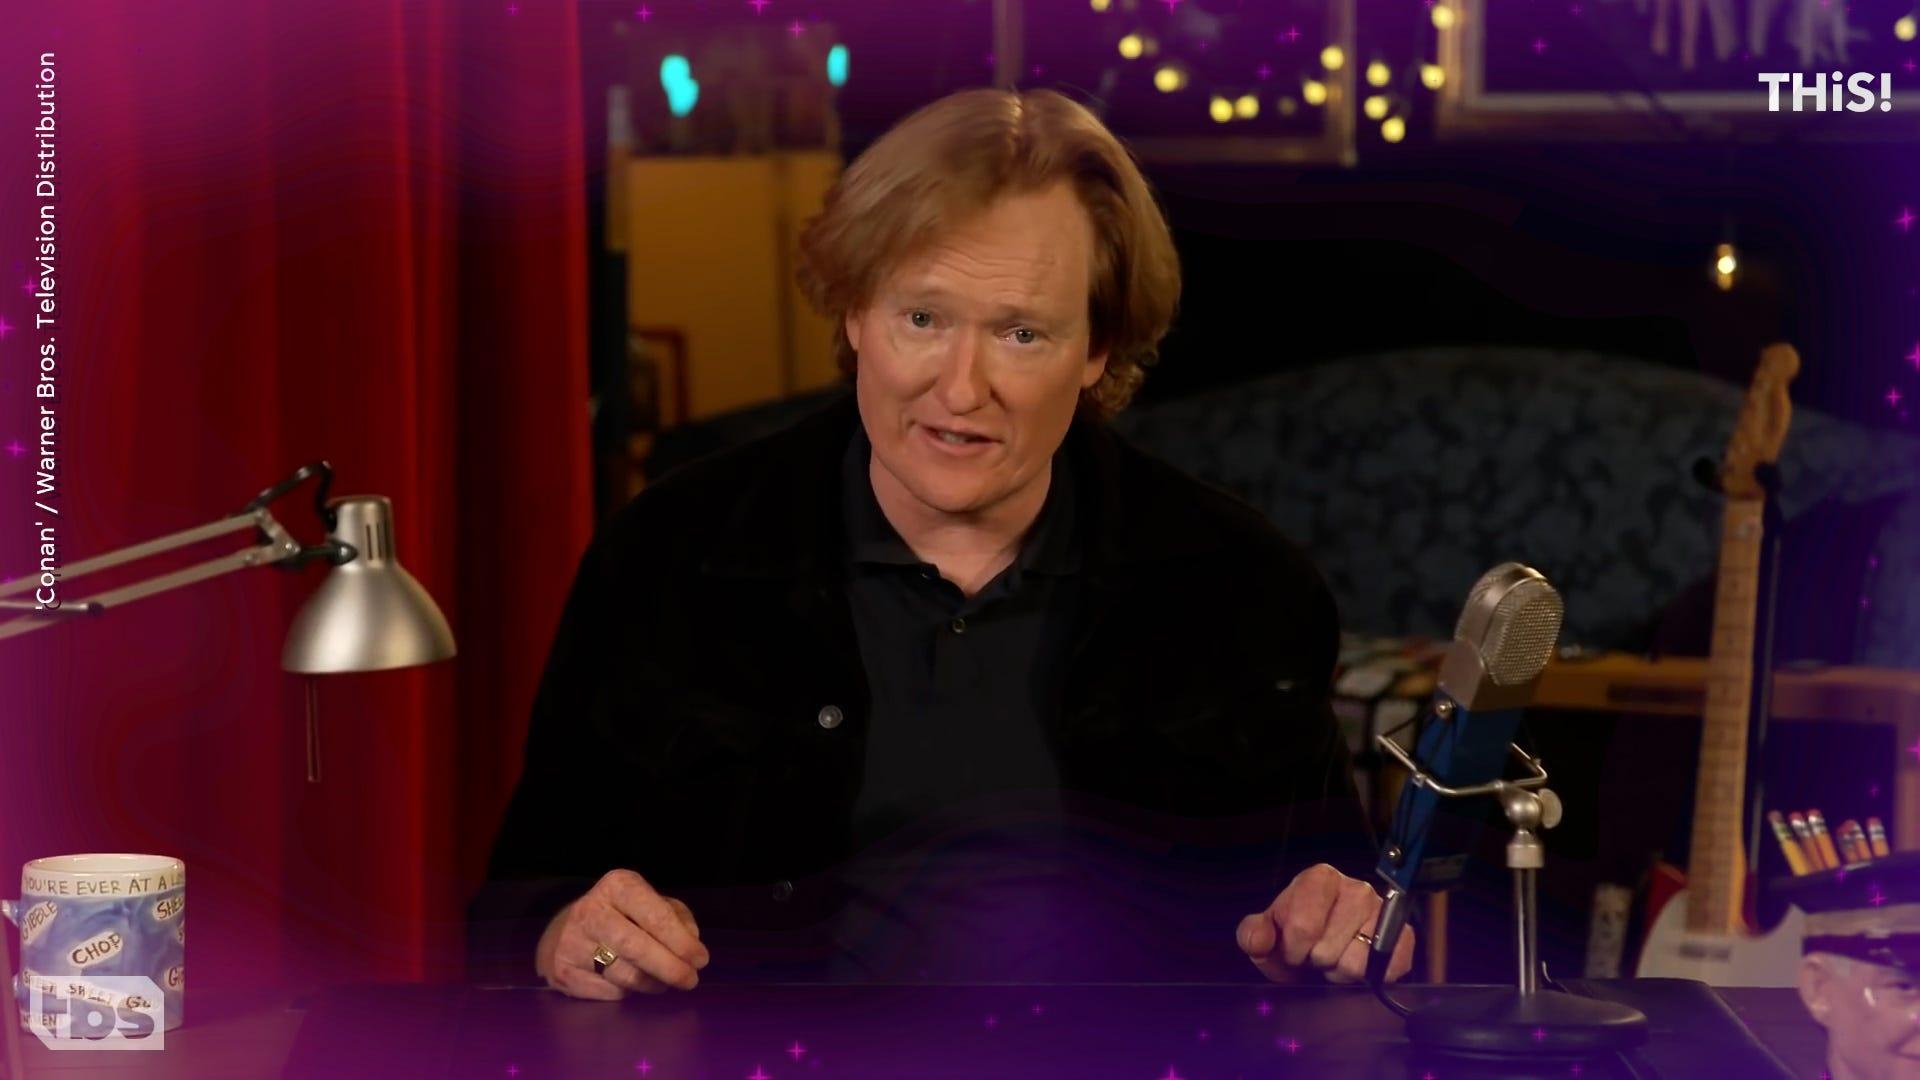 Conan O'Brien says a burglar hit his talk show set: 'We got robbed Andy!'